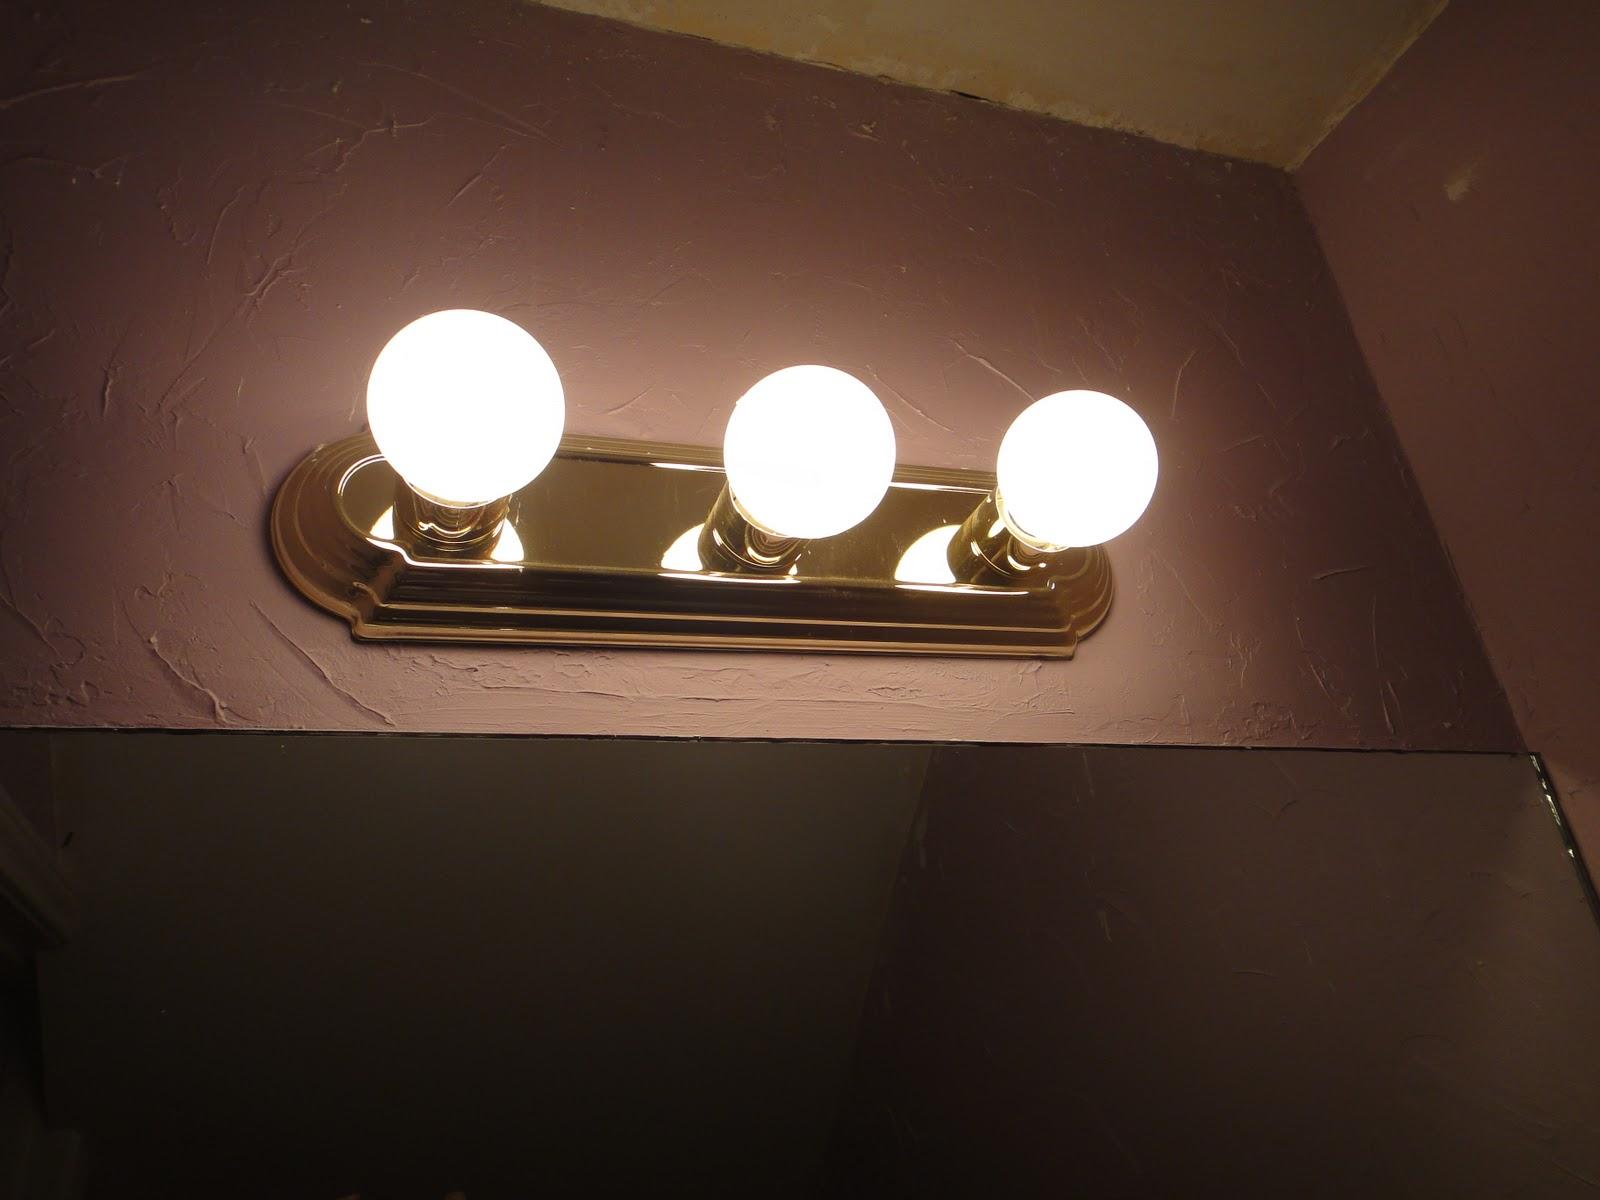 Bathroom Vanity Light With Power Outlet thrifty little blog: september 2010